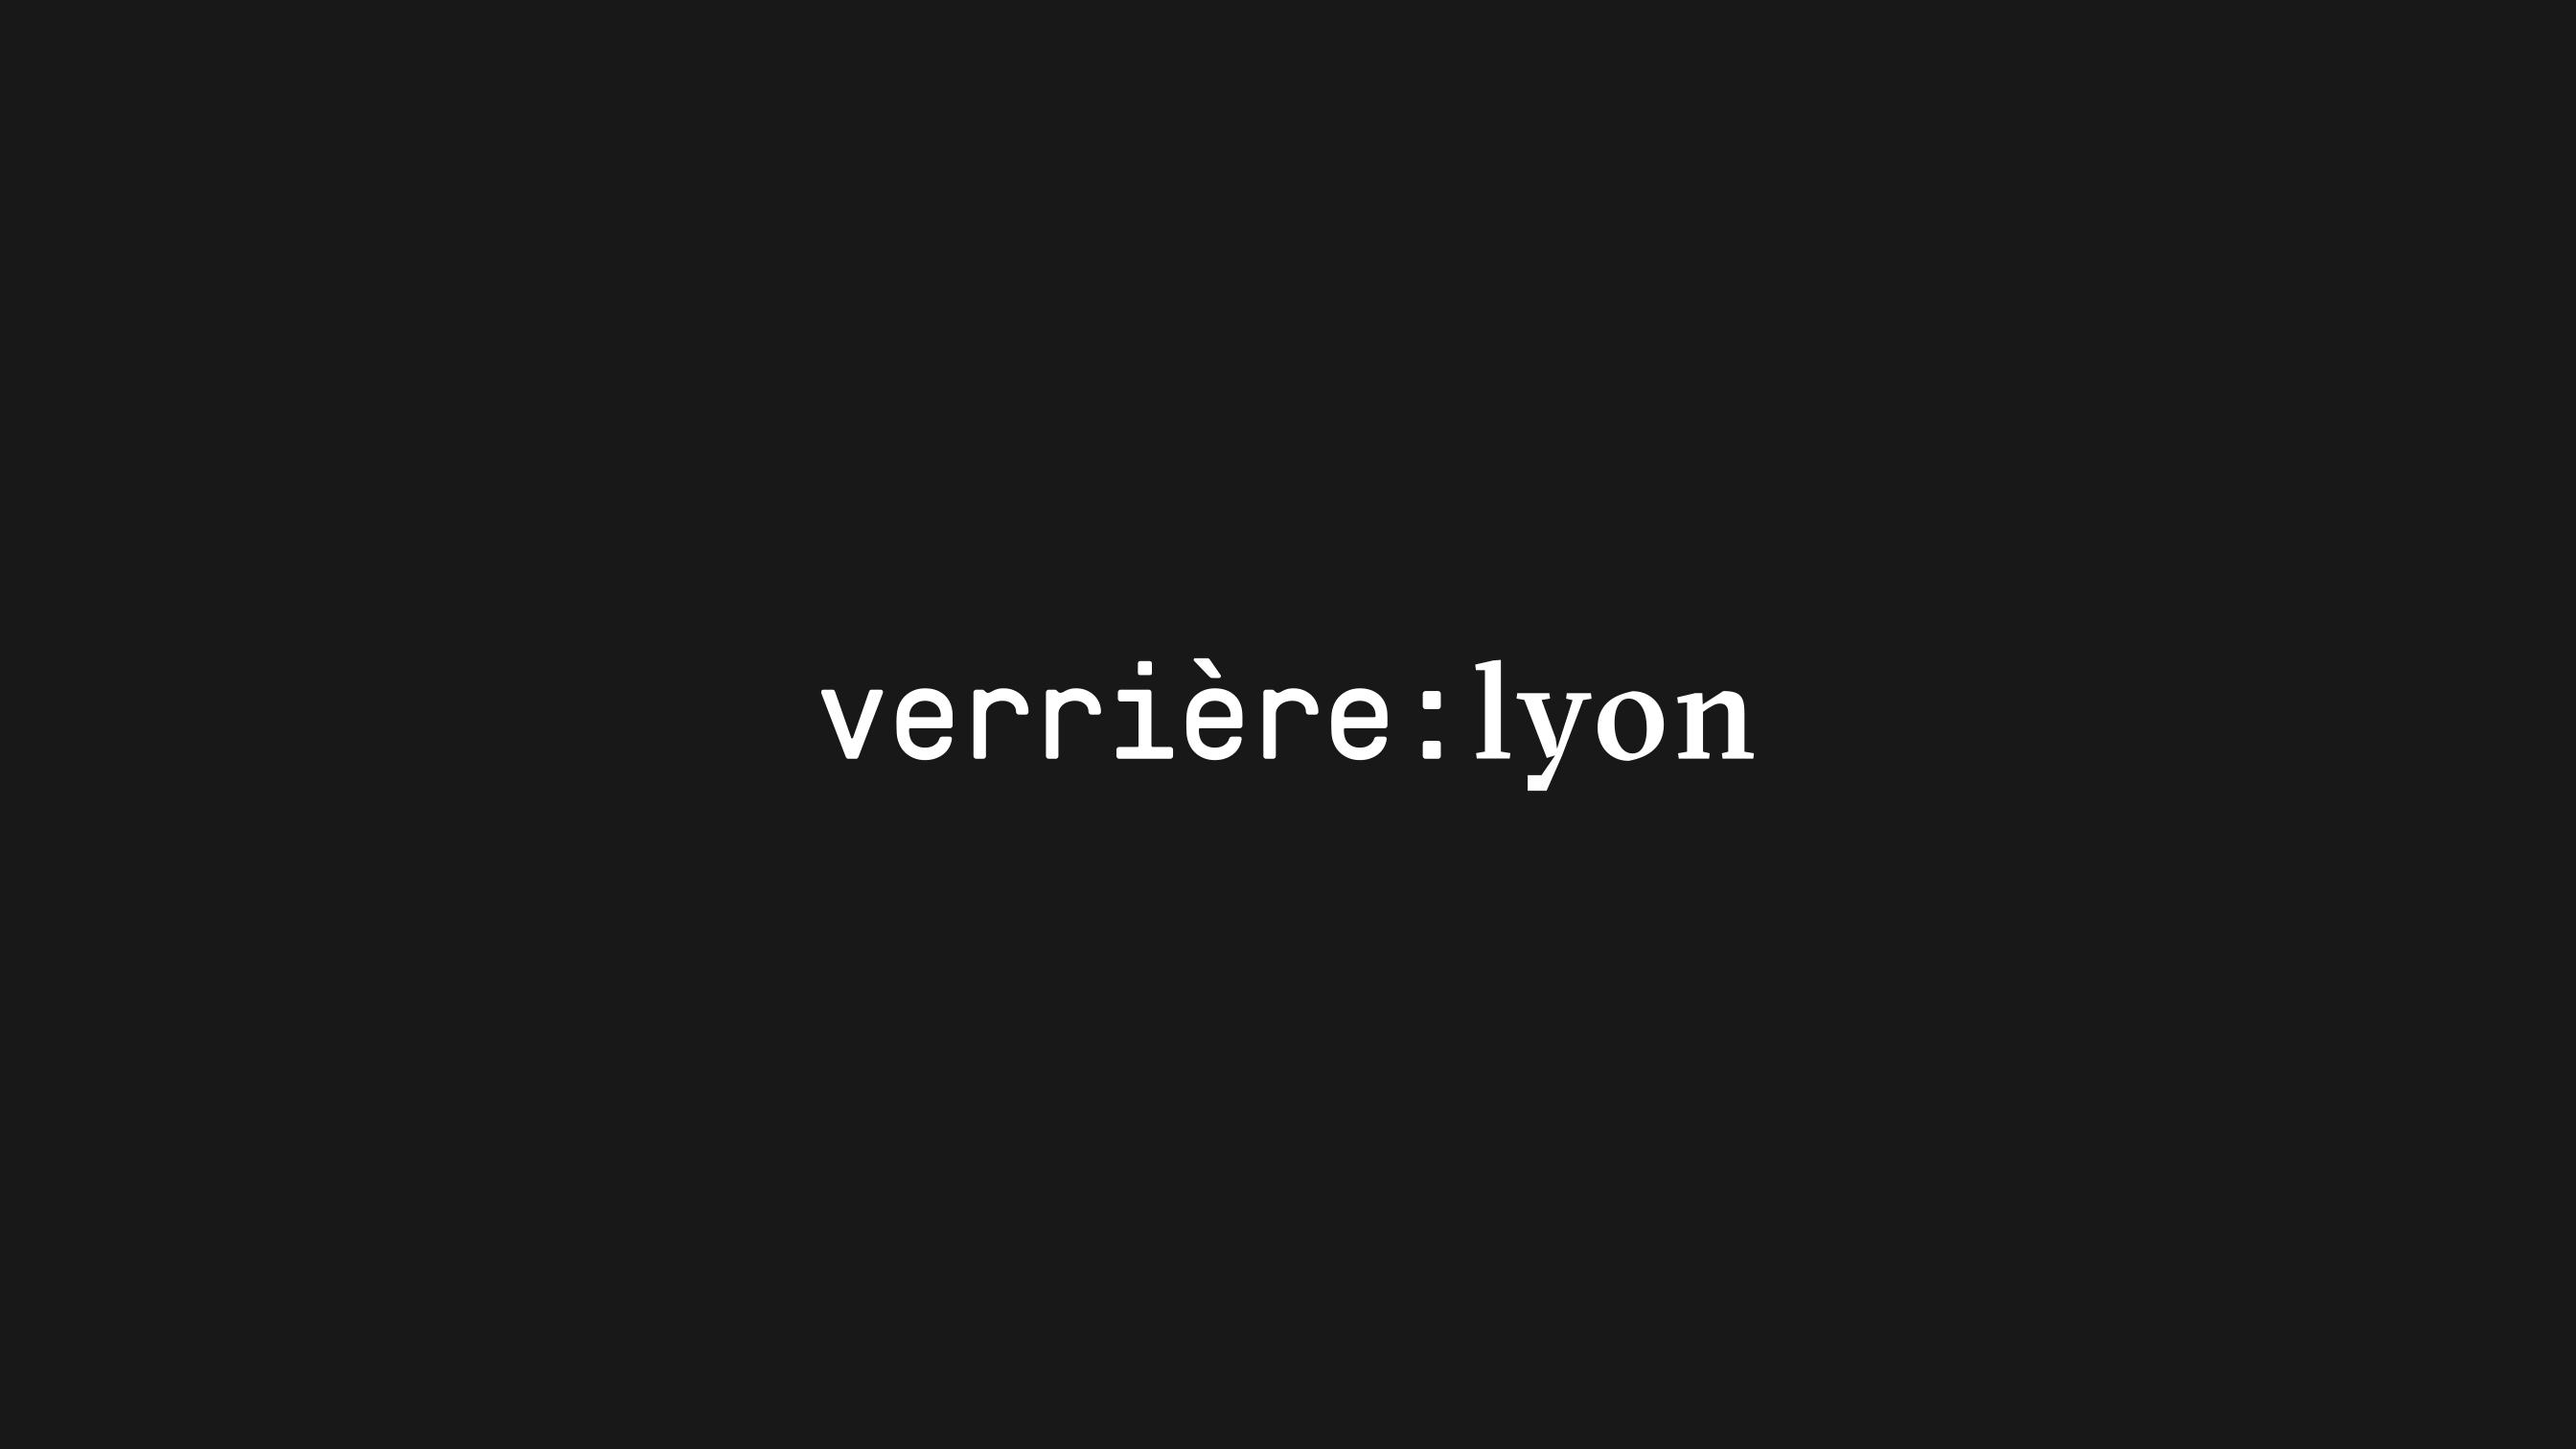 showcase-logotype-verriere-lyon